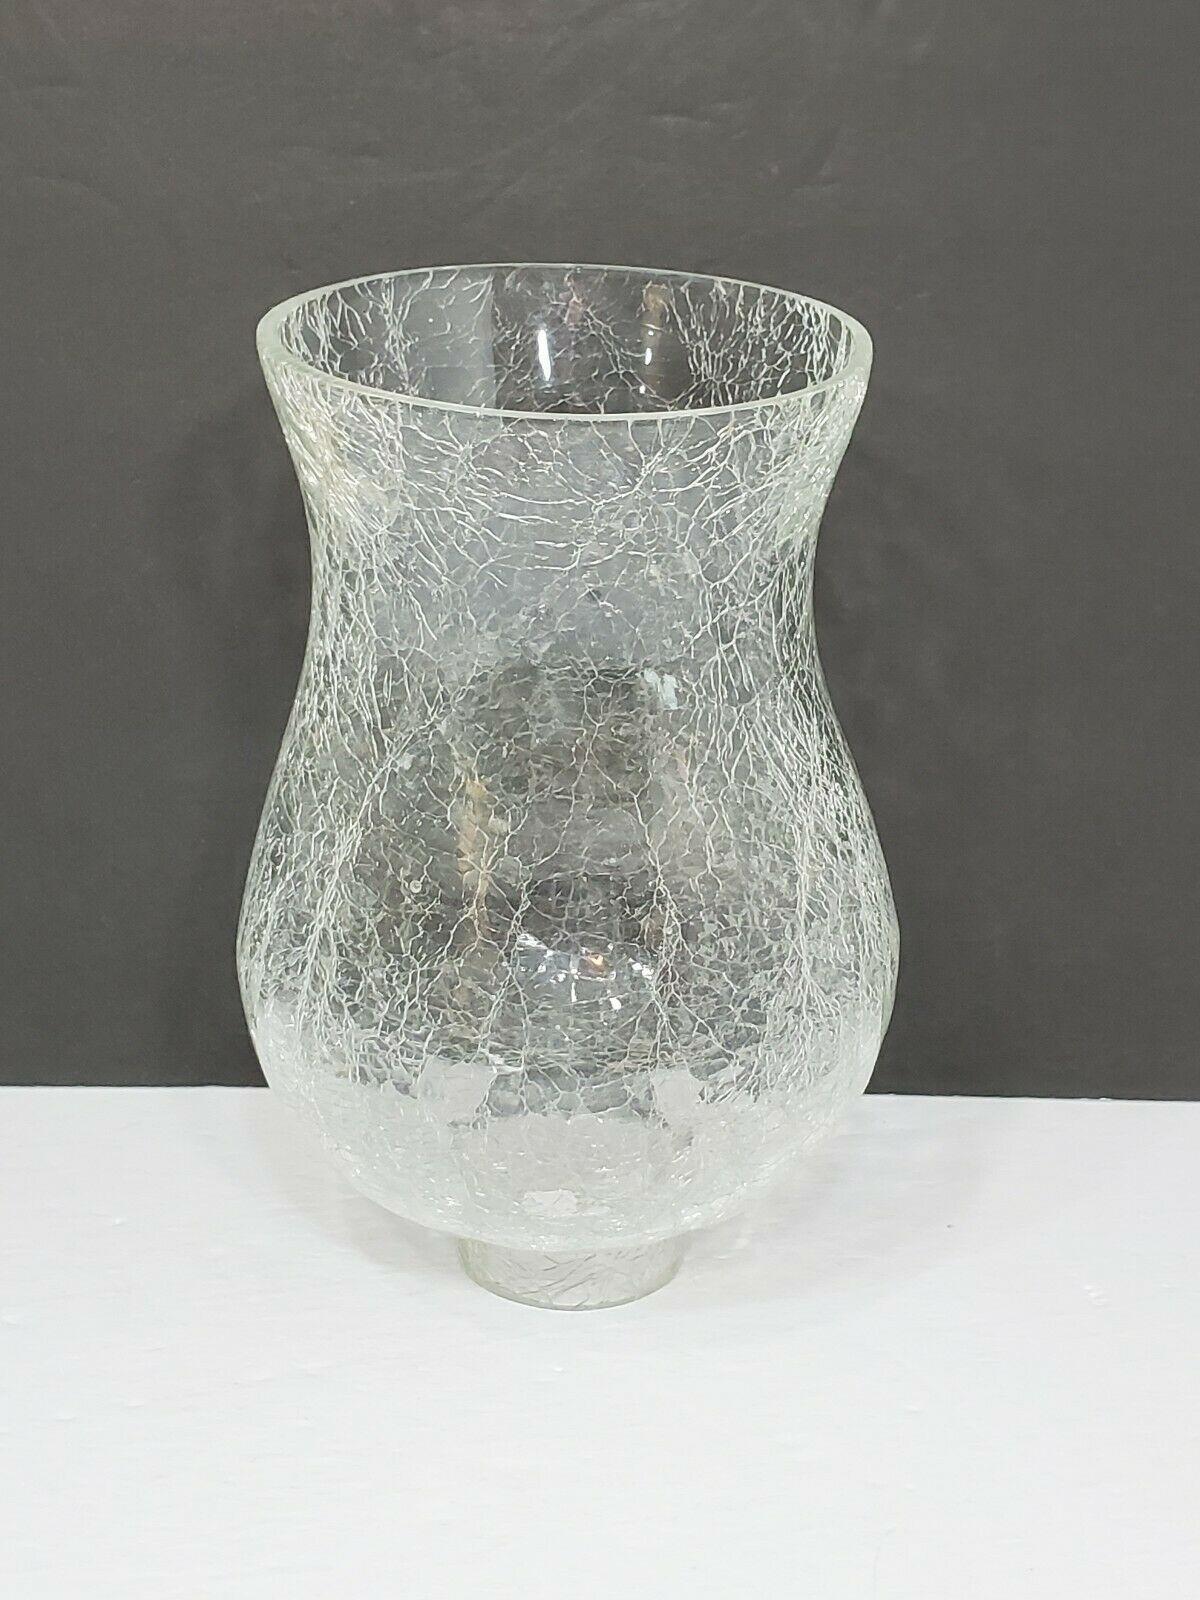 6 3 8 Crackle Glass Hurricane Chimney Candle Sconce Lamp Shade Globe Mcm 15 00 Glass Hurricane Candle Holder Milk Glass Candle Holder Candle Lampshade